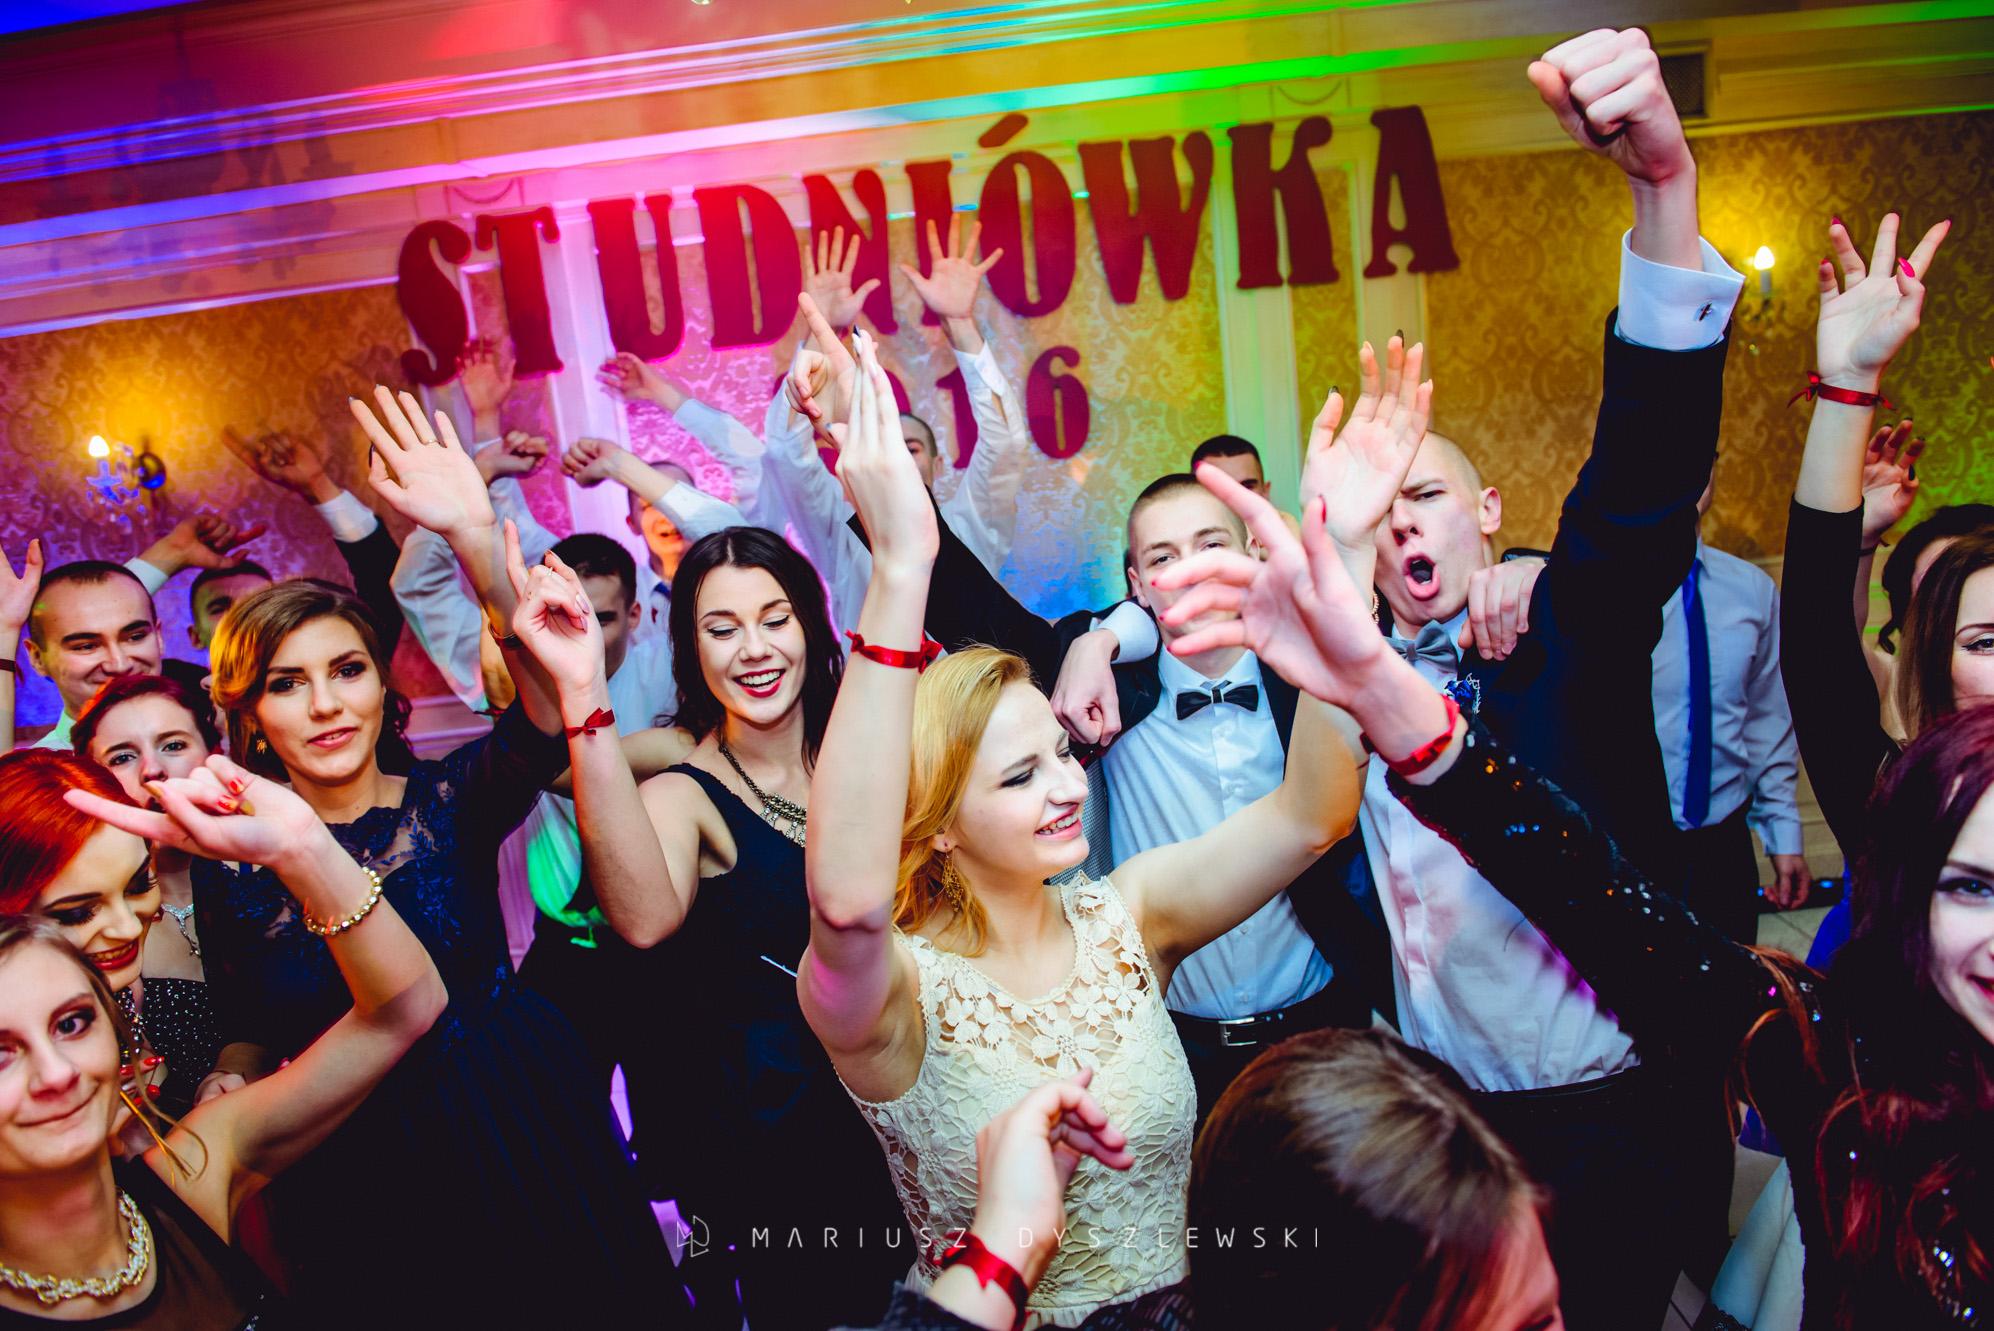 studniówka_rolnik_mariusz_dyszlewski_fotograf